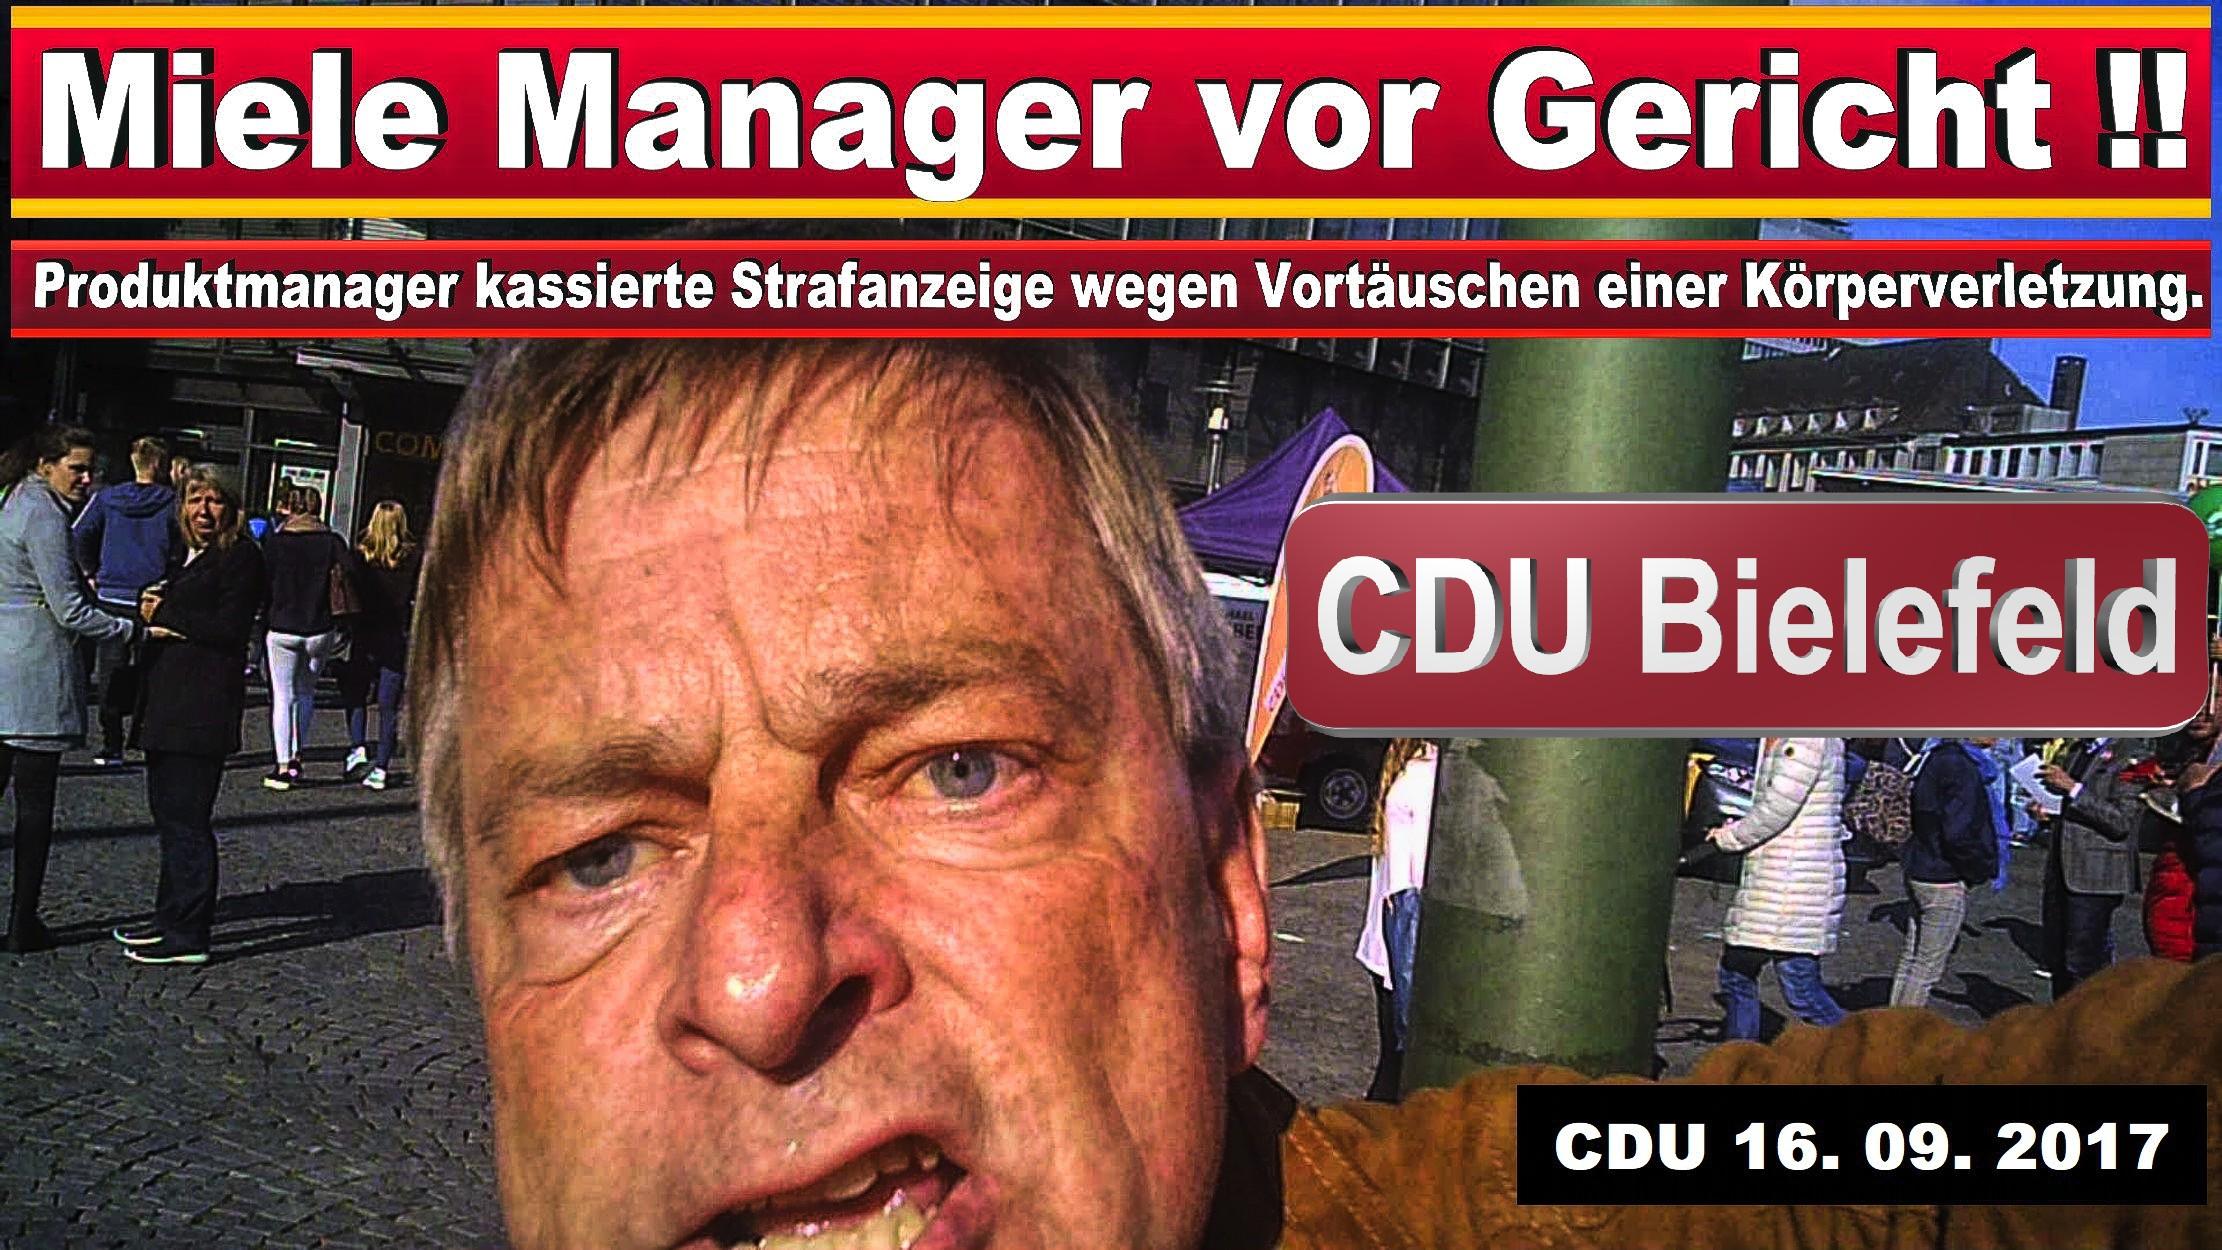 CDU IN BIELEFELD MICHAEL WEBER MIELE GüTERSLOH PRODUKTMANAGER JURIST SPD FDP AFD BIELEFELD